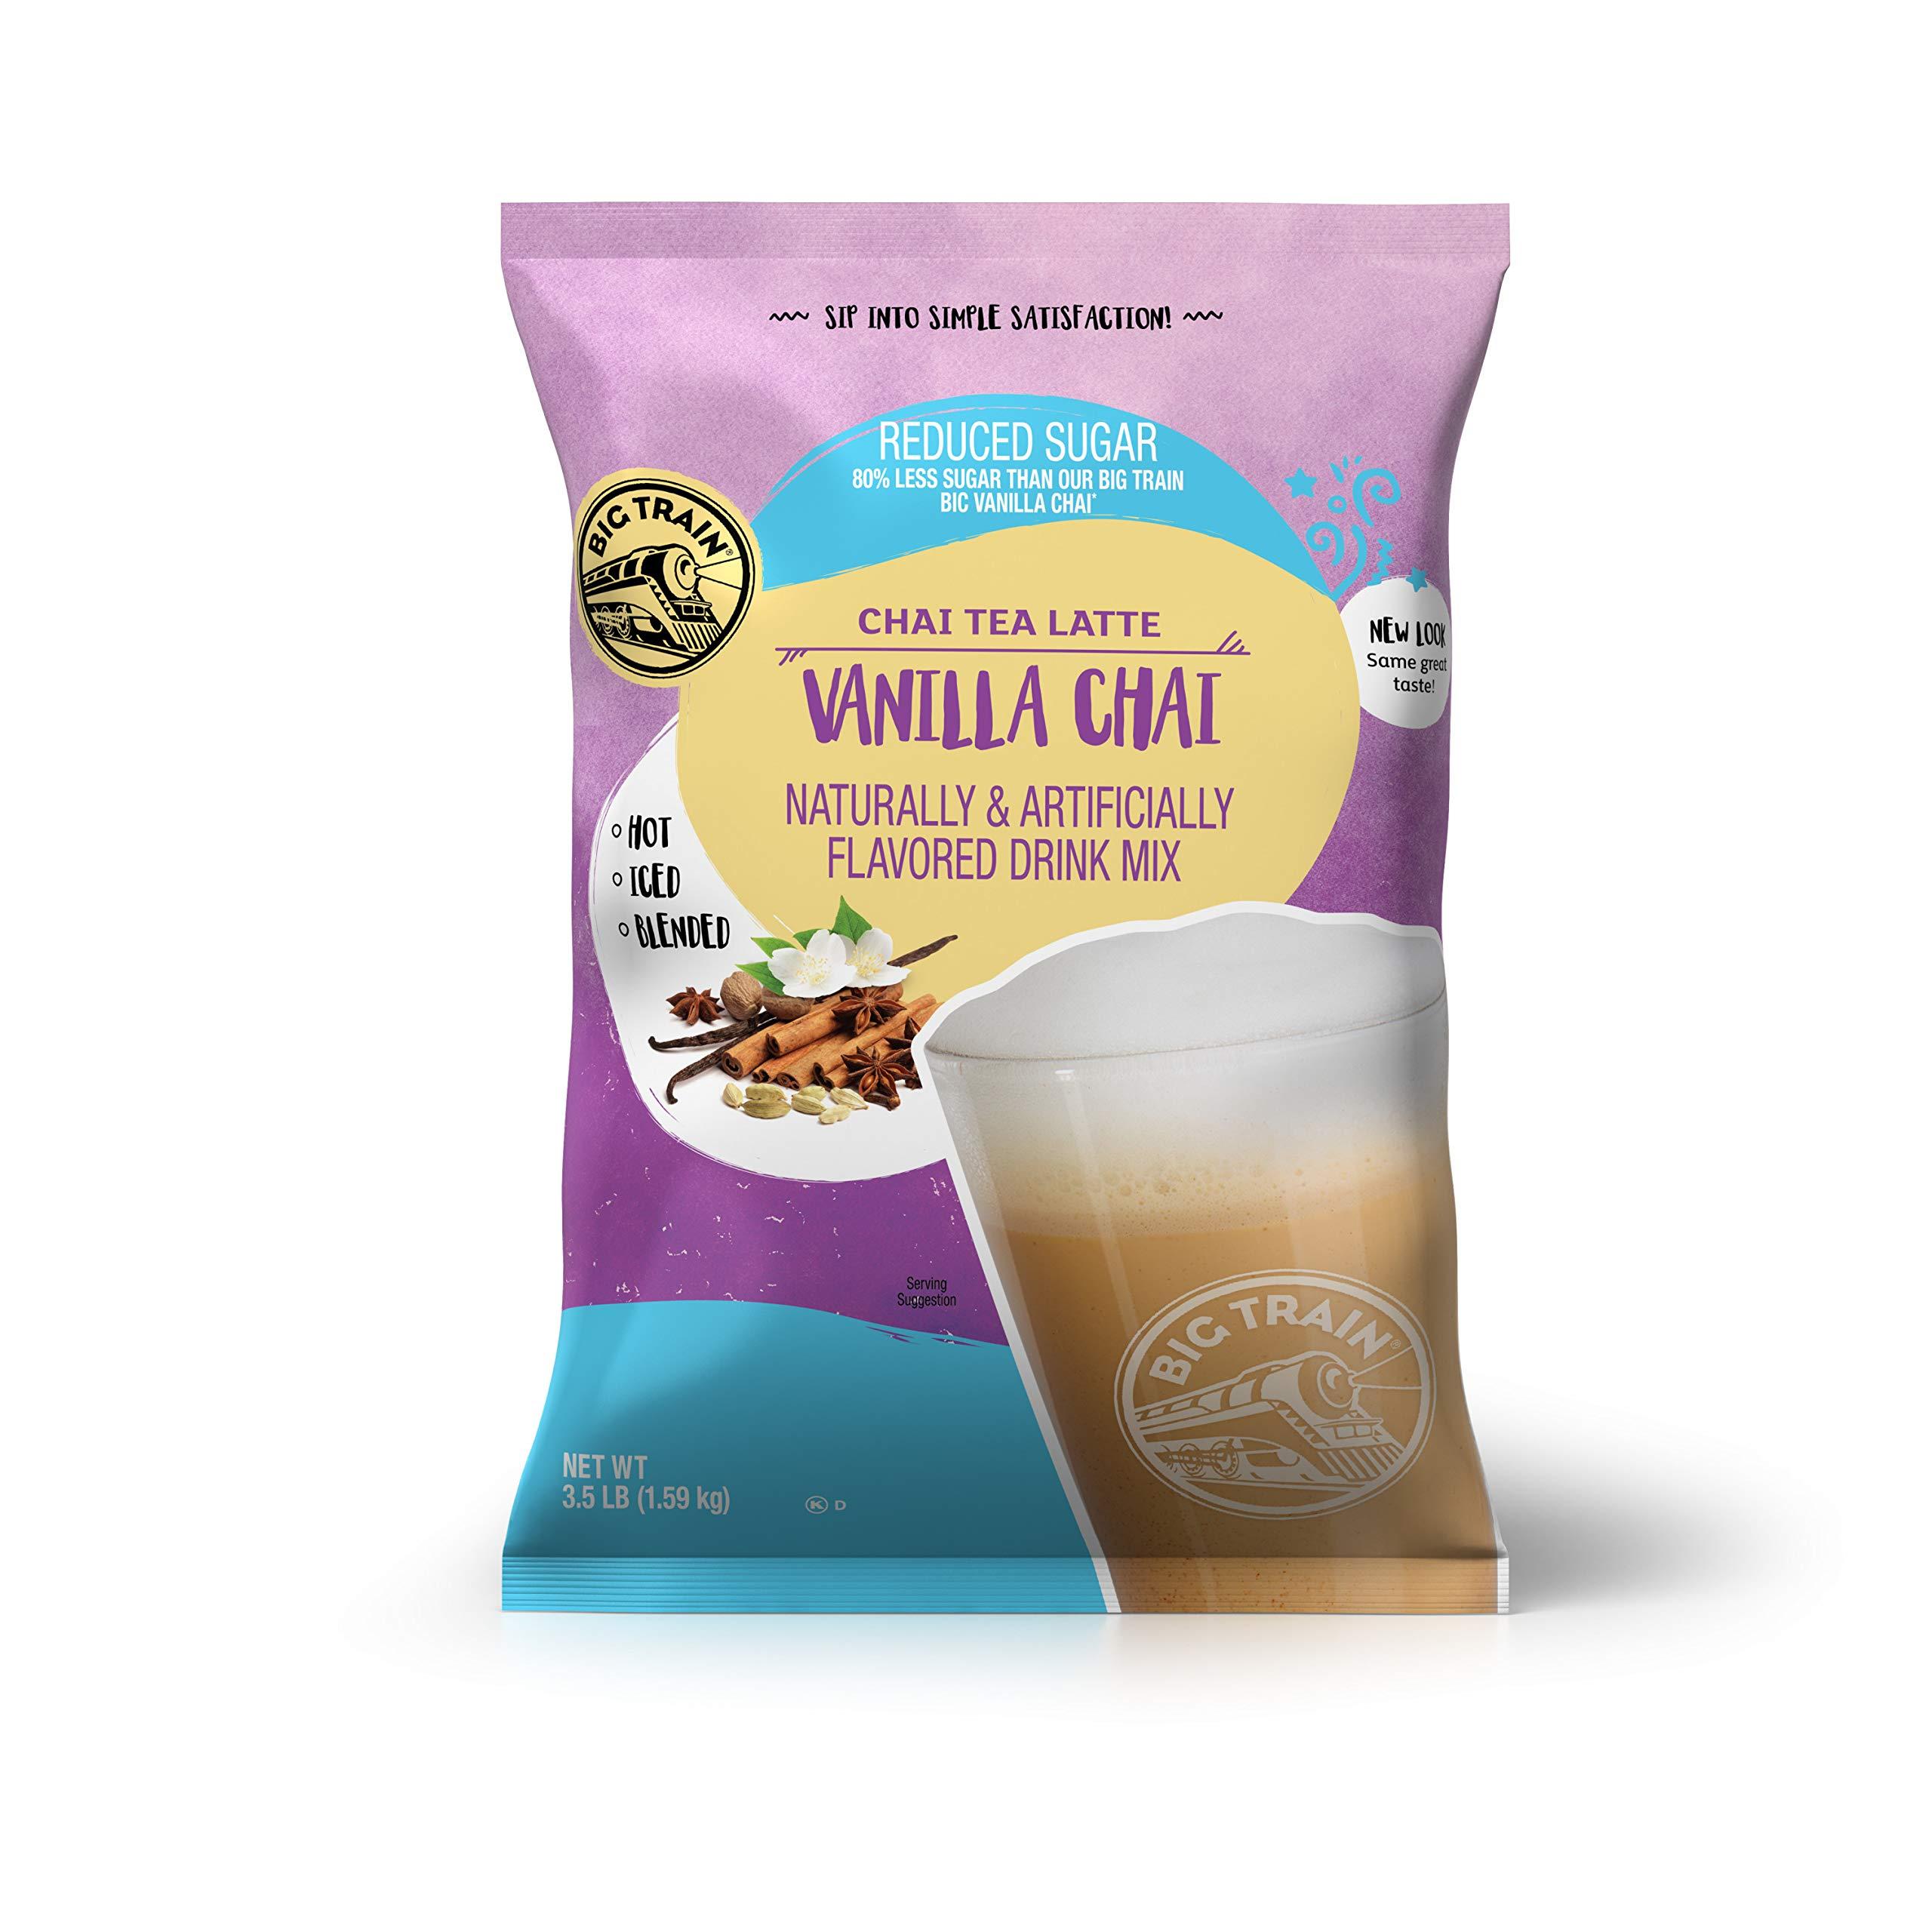 Big Train Chai Tea Latte, Reduced Sugar, Vanilla Chai, 56 Ounce, Powdered Instant Chai Tea Latte Mix, Spiced Black Tea with Milk, For Home, Cafe, Coffee Shop, Restaurant Use